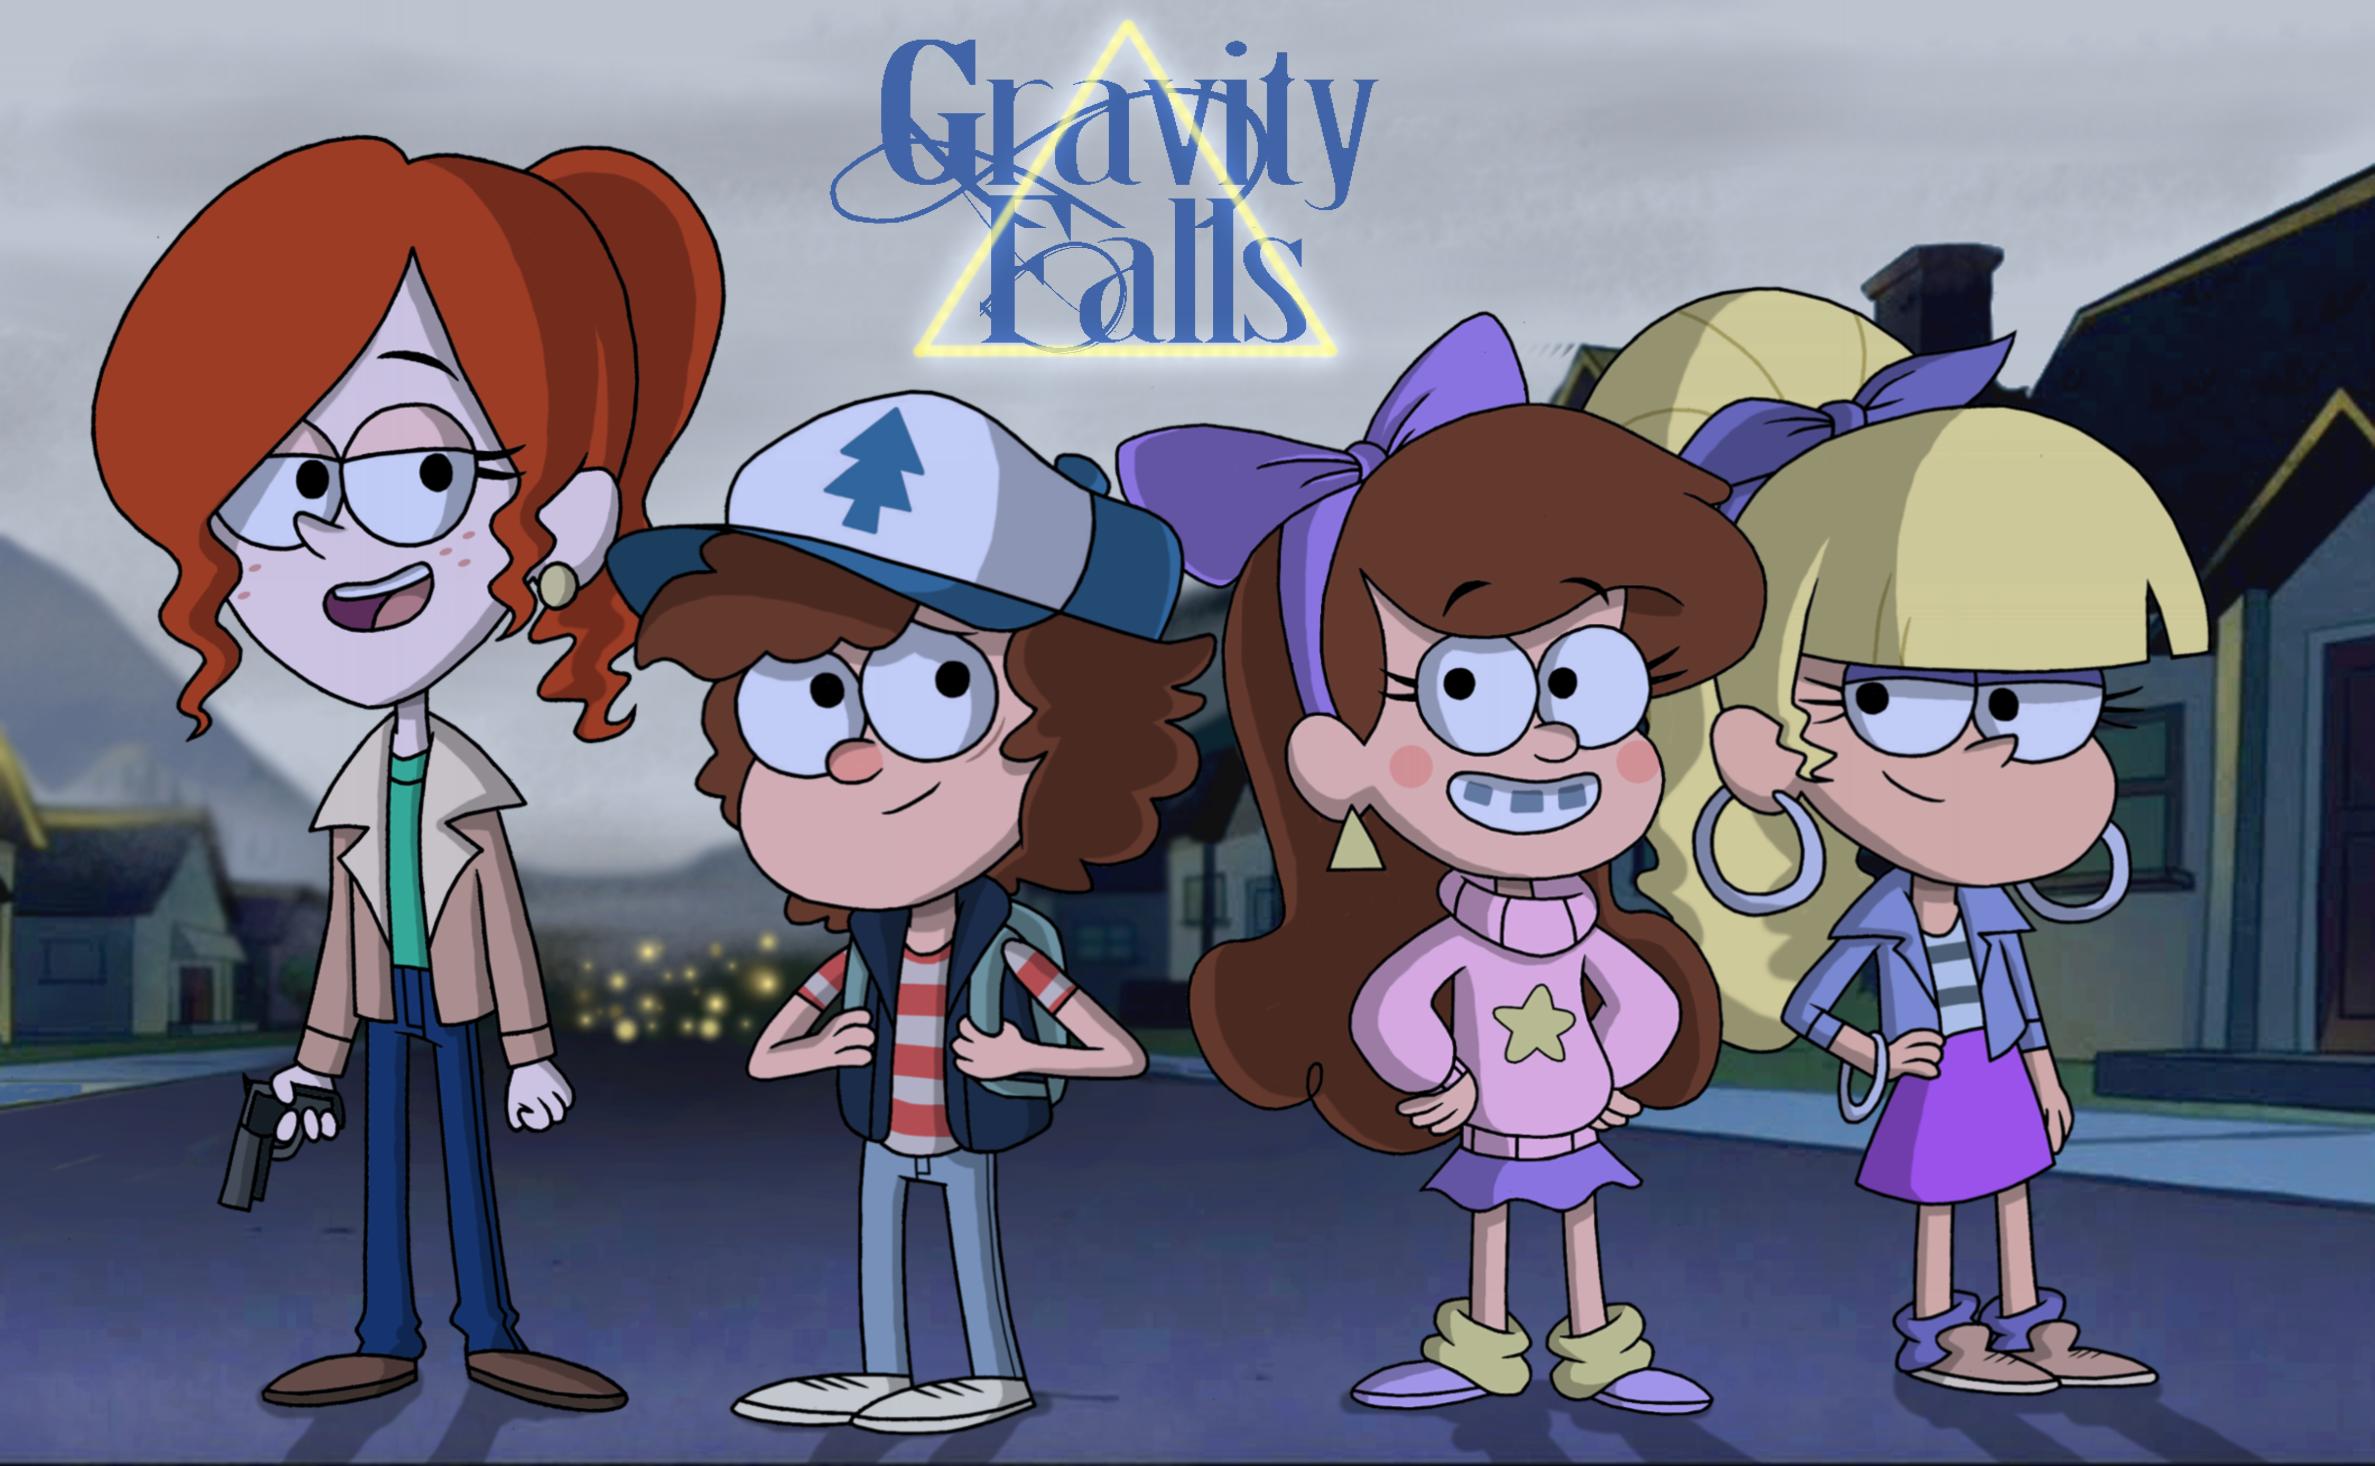 Gravity Falls 80s AU